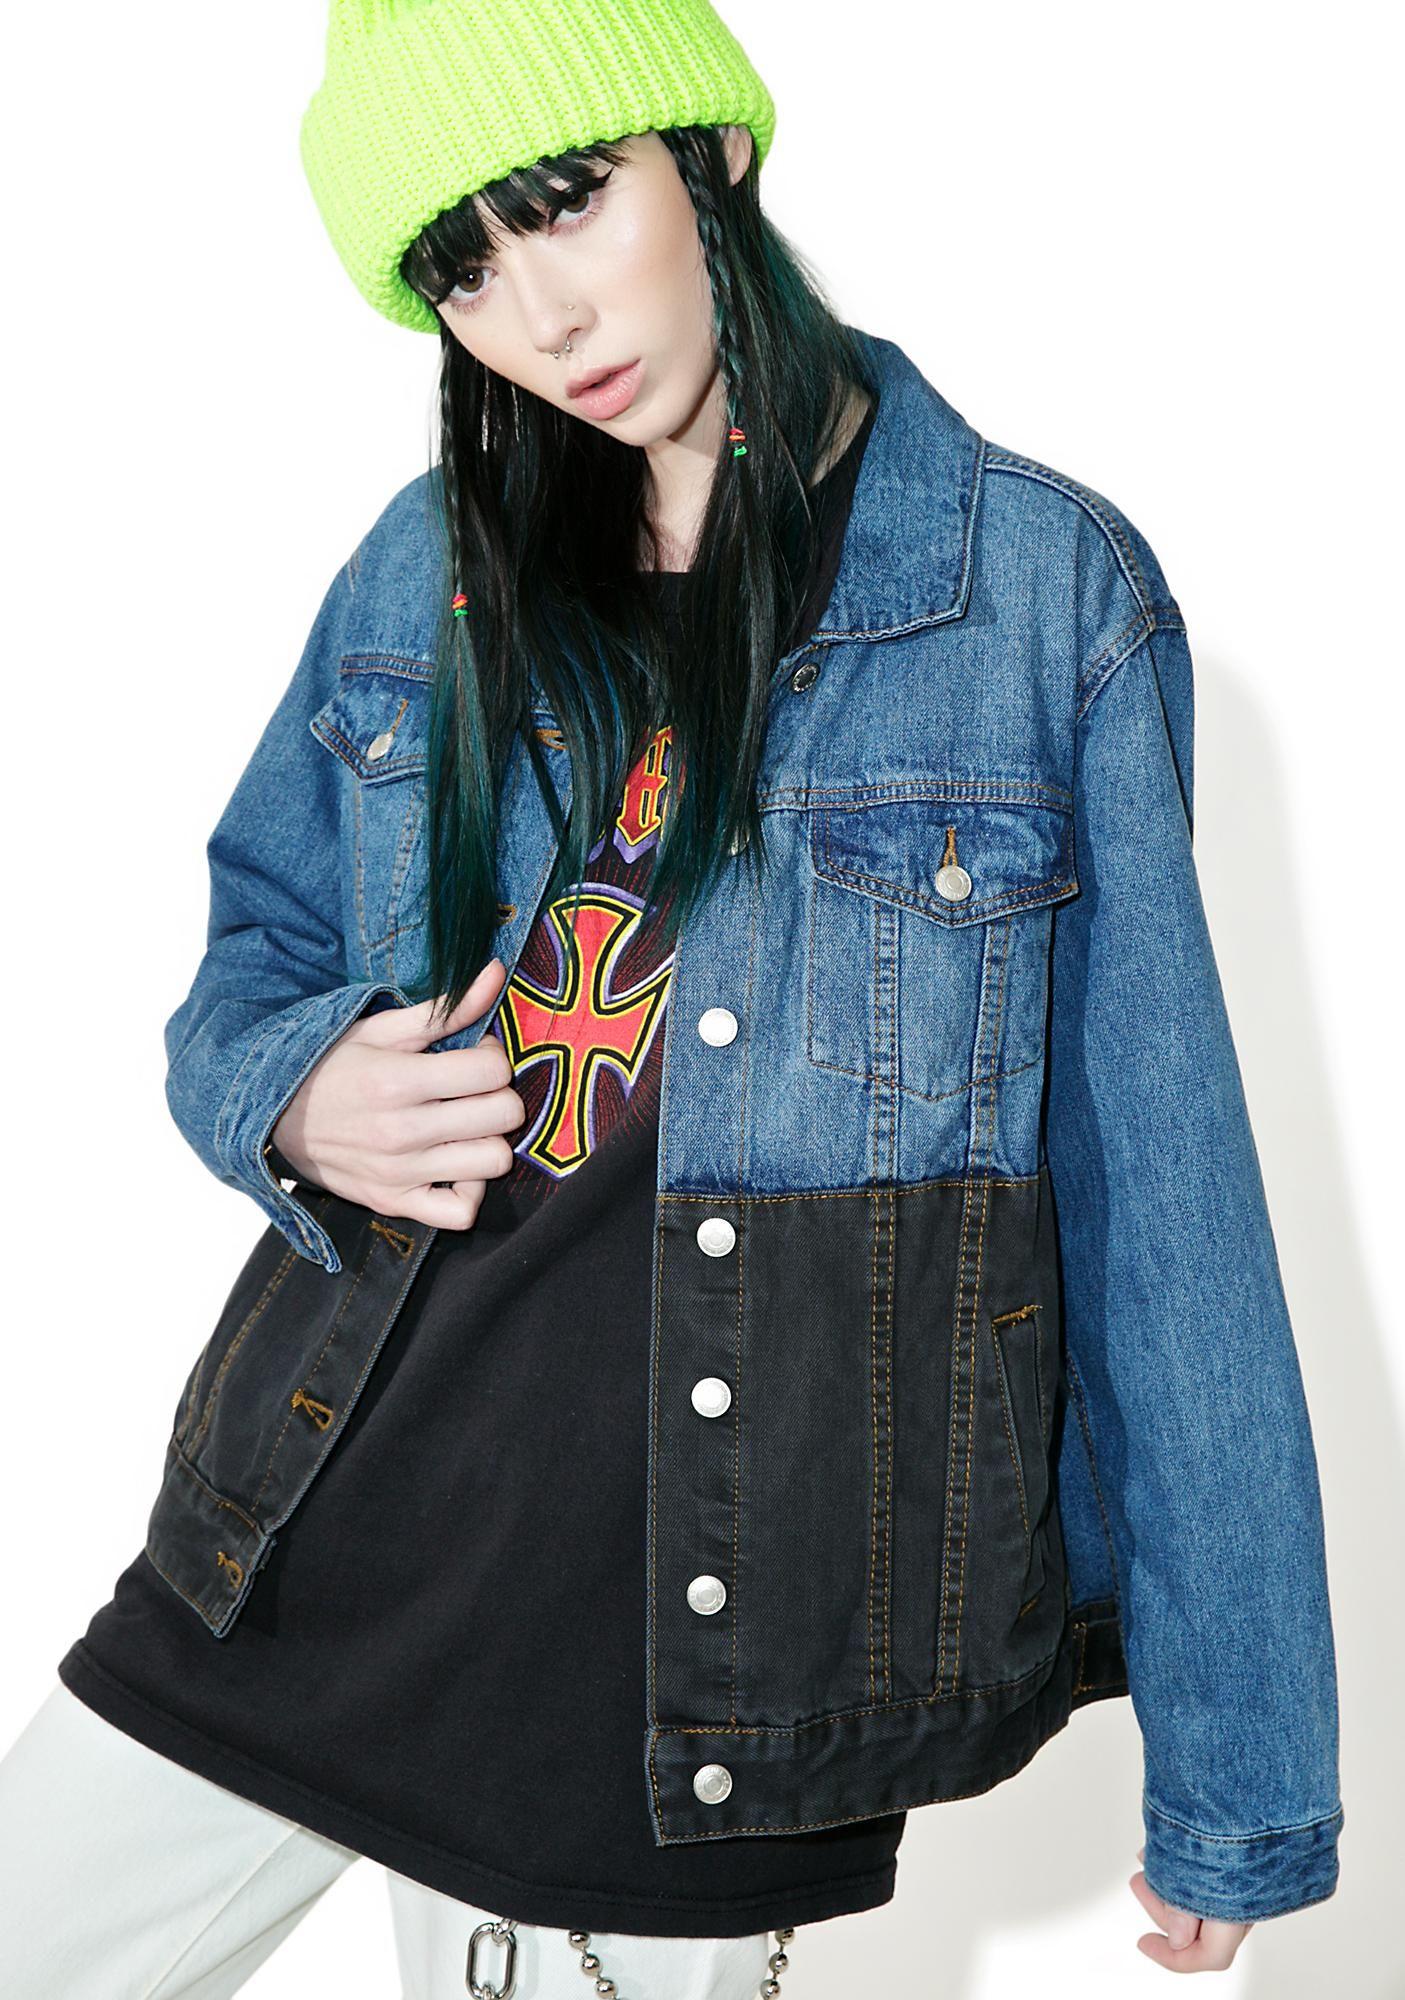 Black N Blue Denim Jacket Denim Jacket Blue Denim Jacket Jackets [ 2000 x 1405 Pixel ]